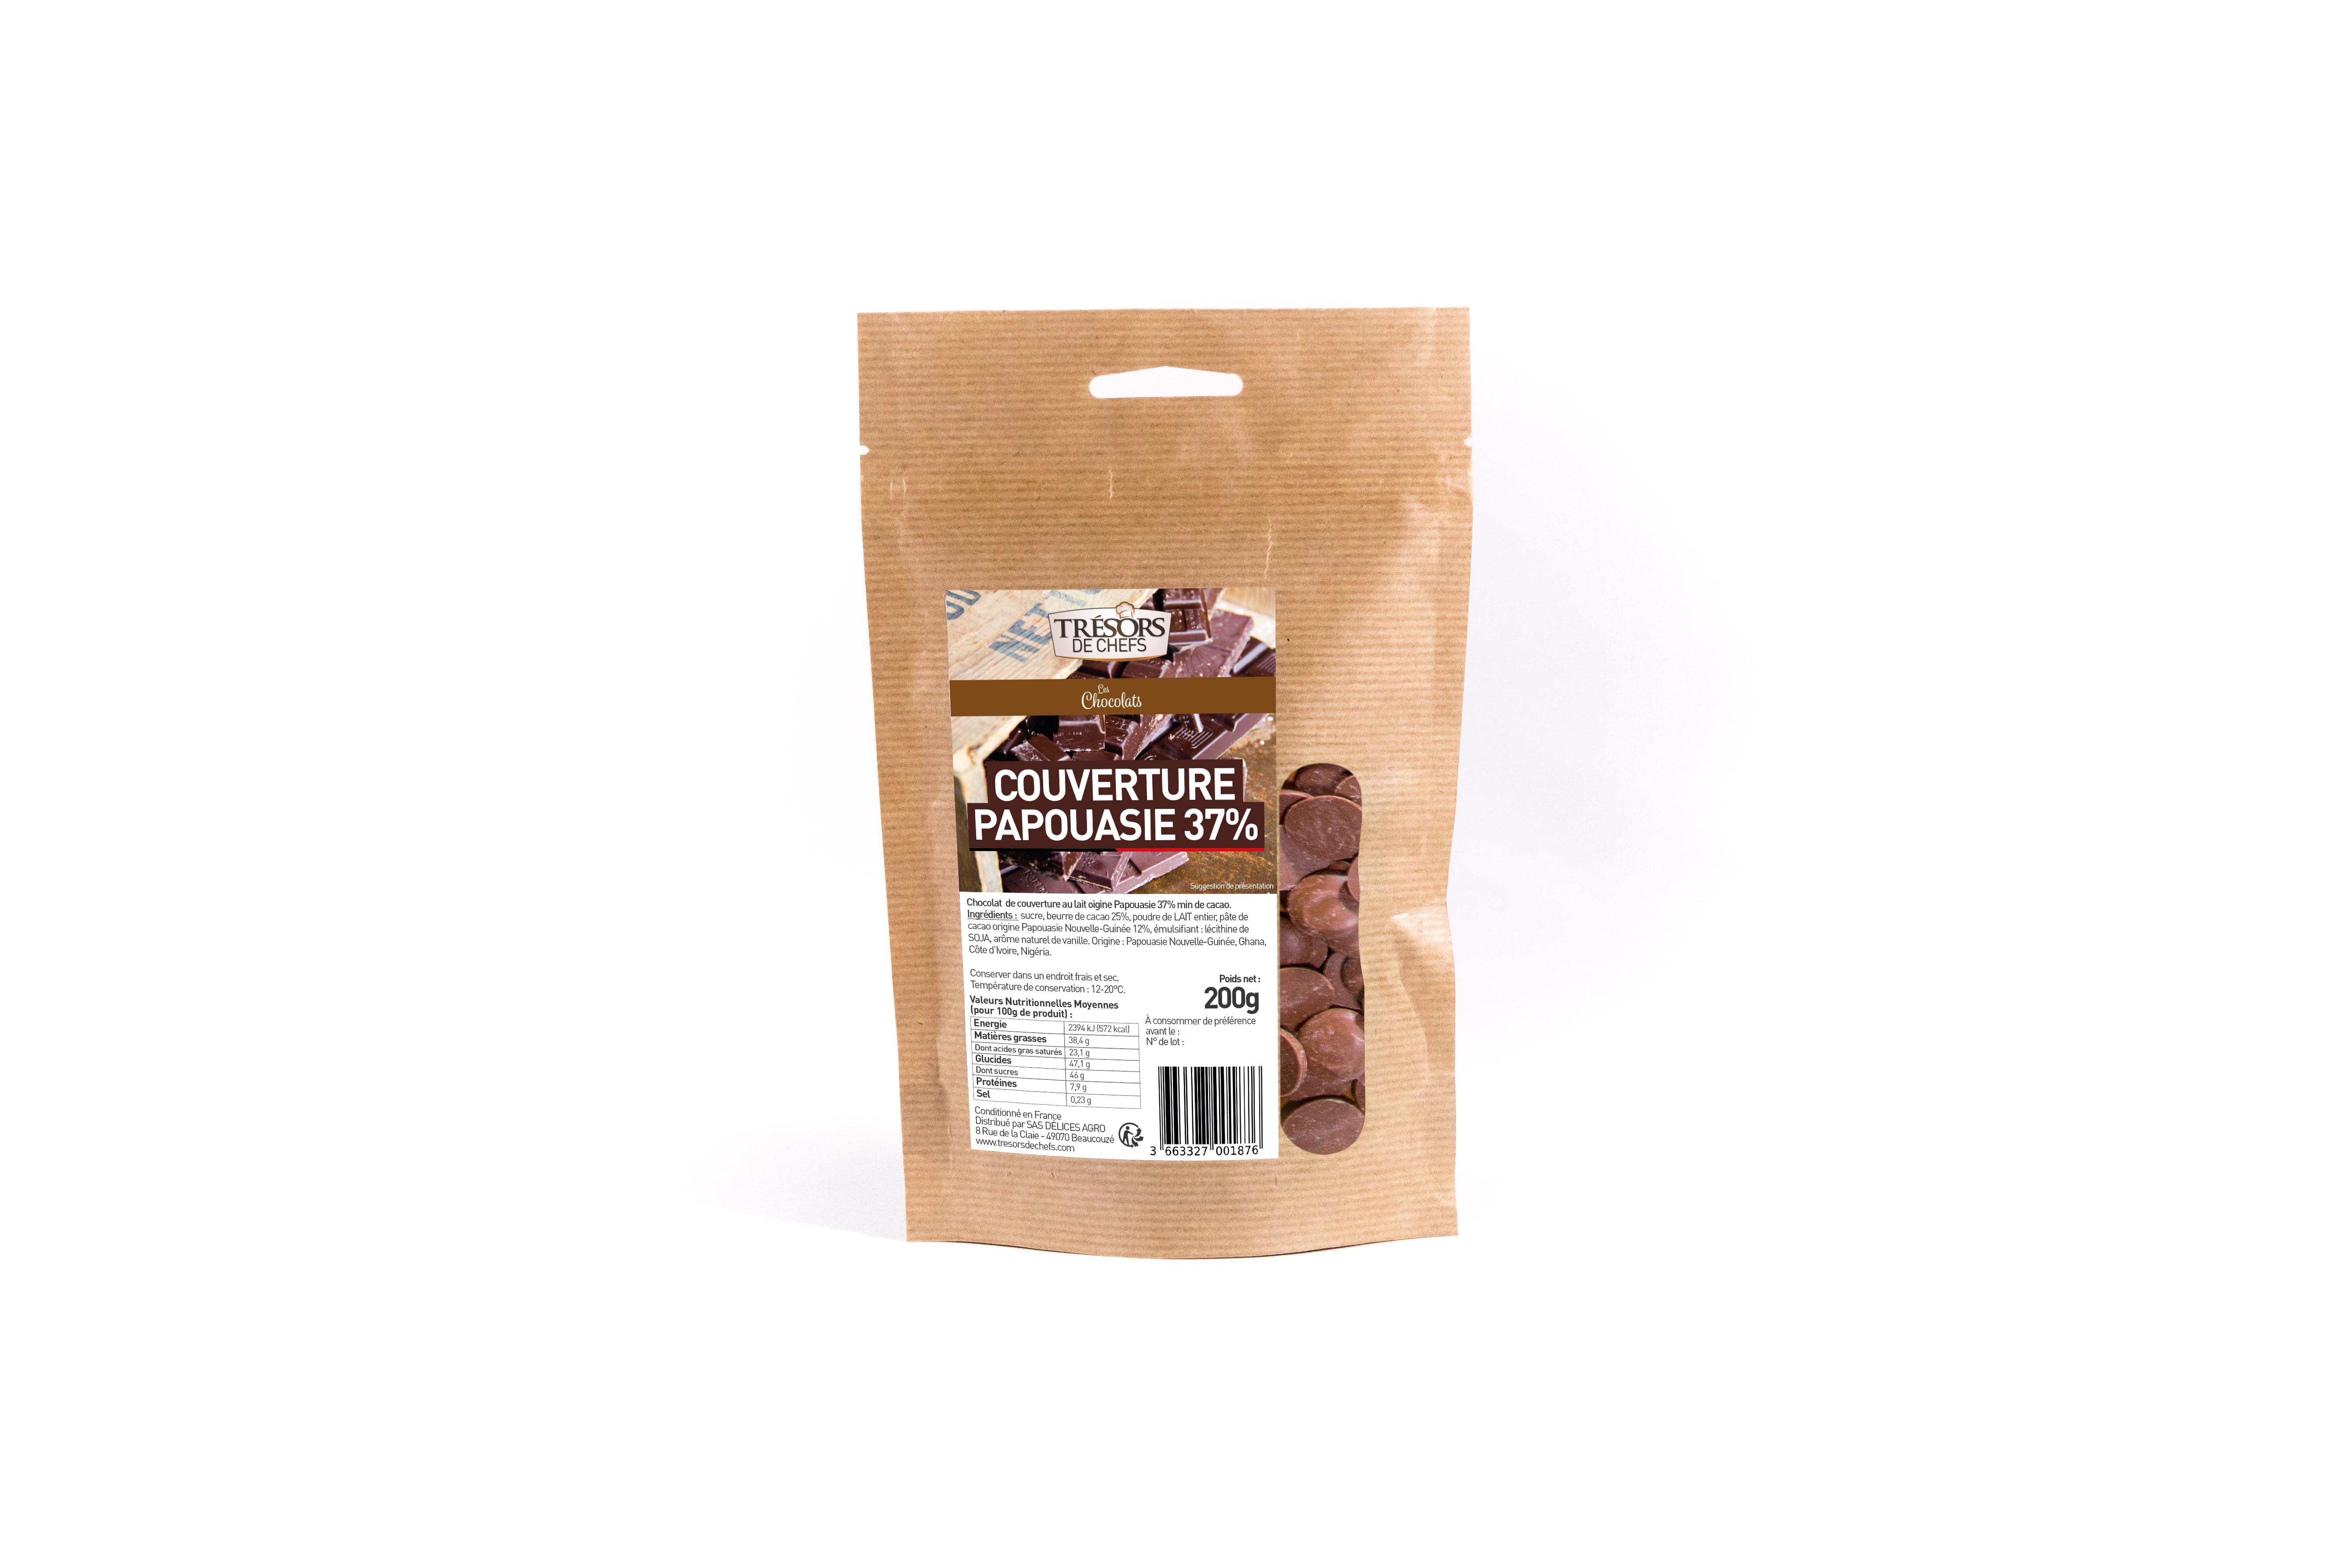 Chocolat au lait - 200g